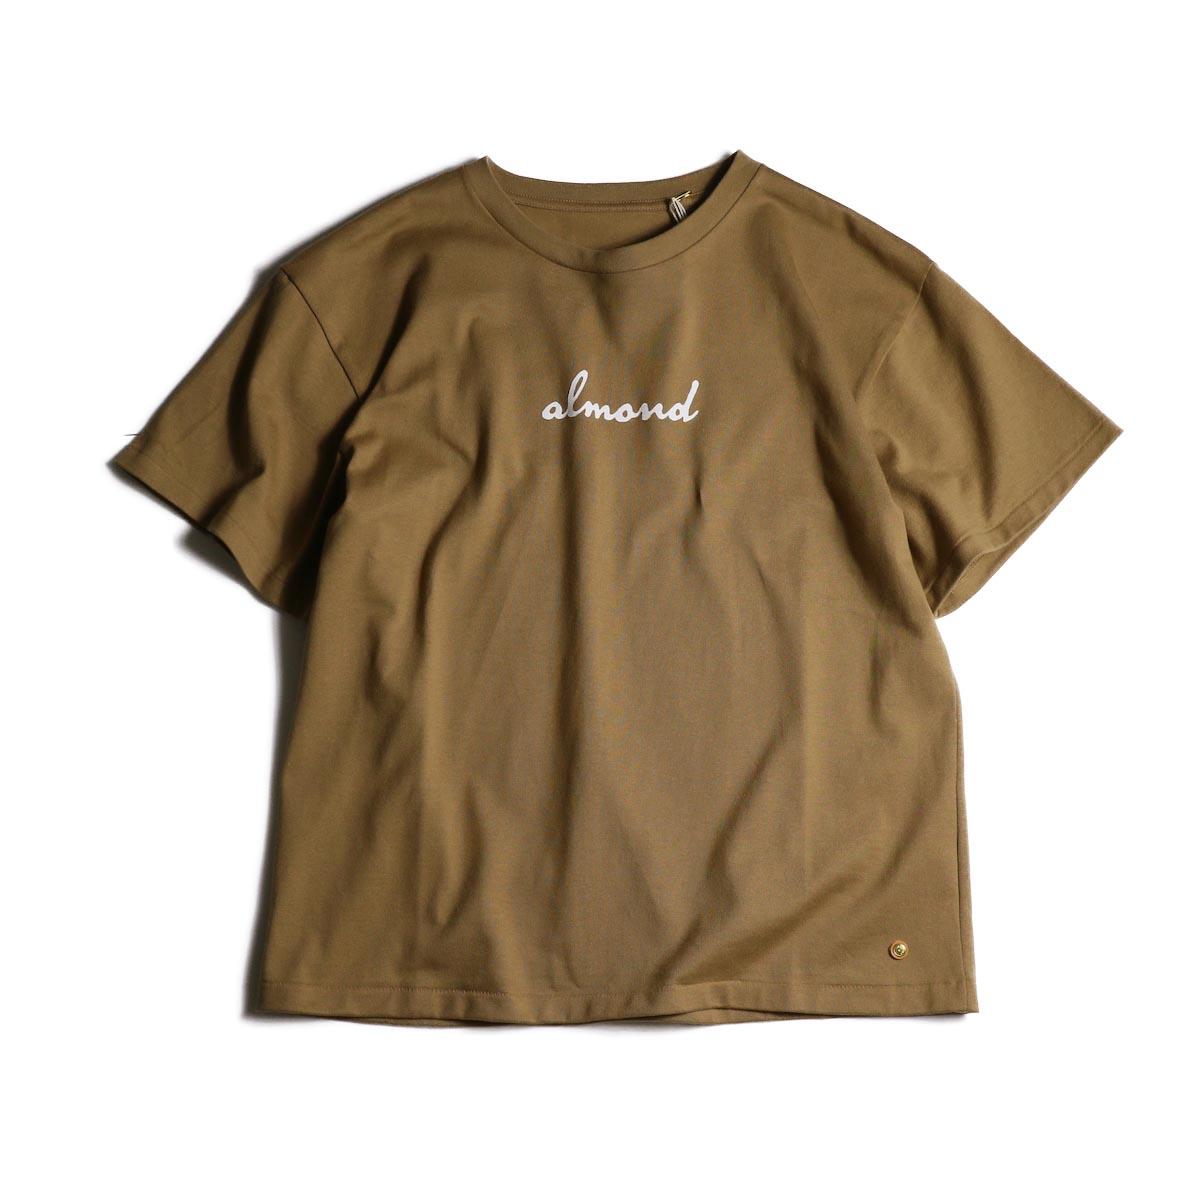 MASTER & Co. / Print T-Shrit (almond)正面